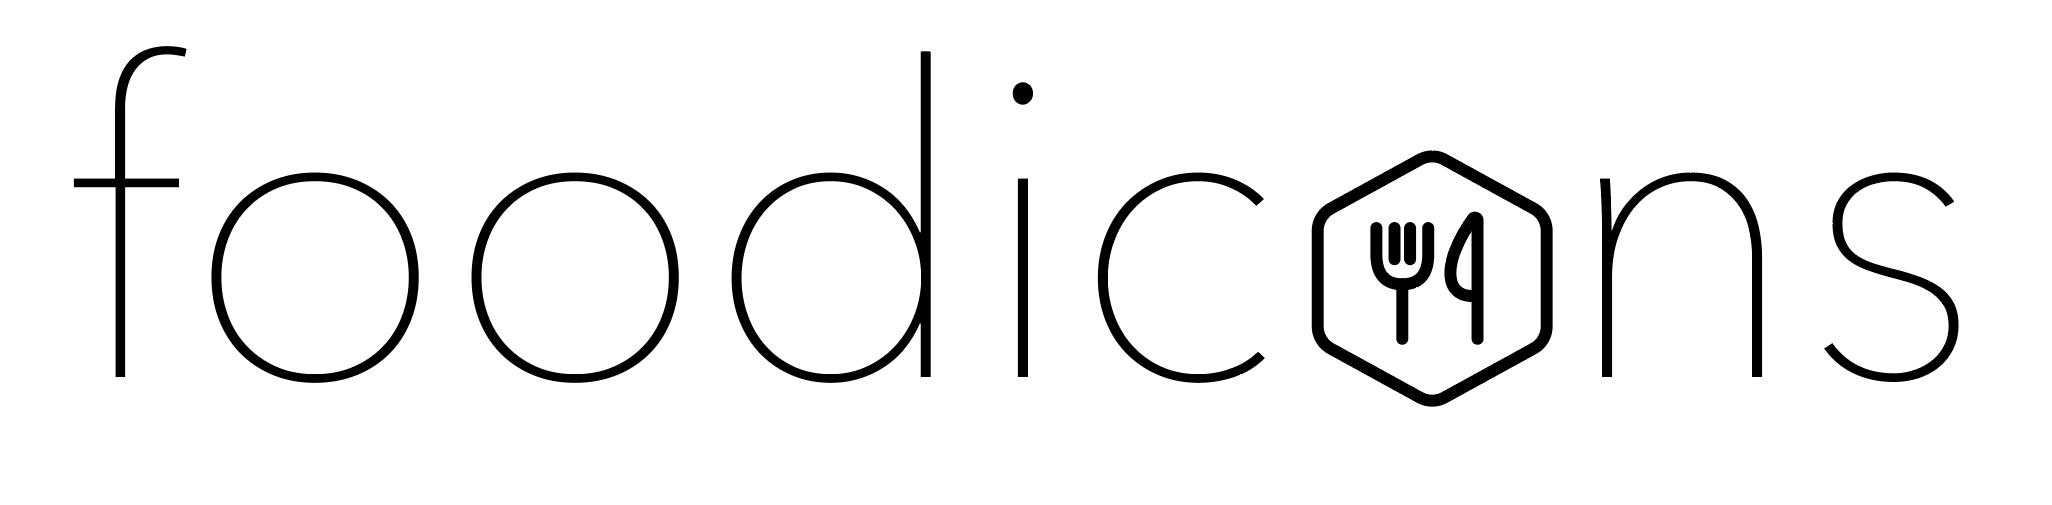 foodicons logotype L